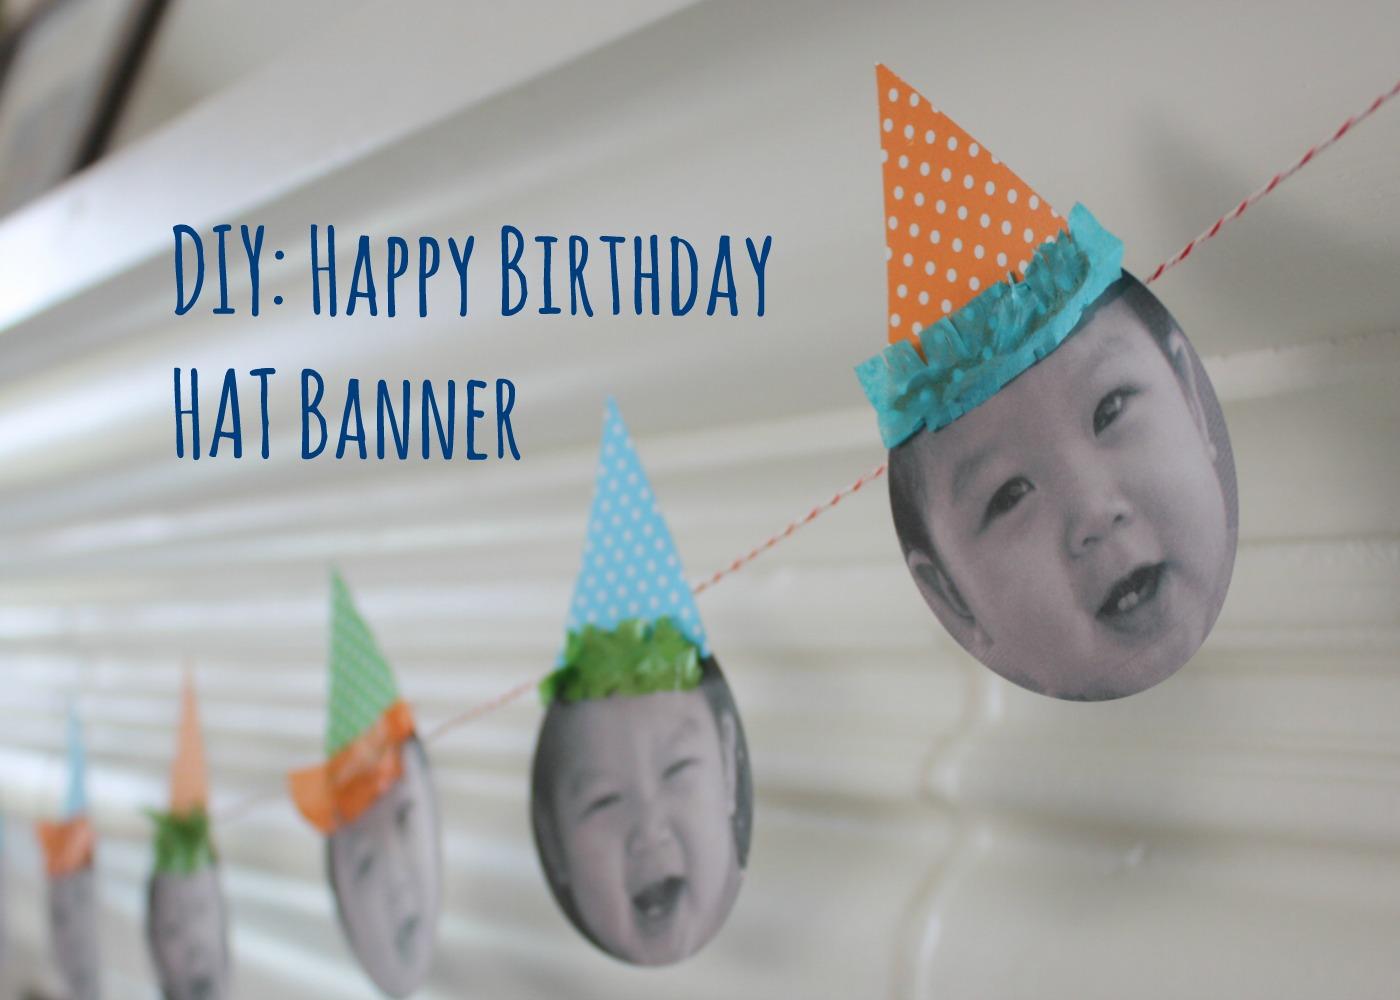 Diy happy birthday hat banner